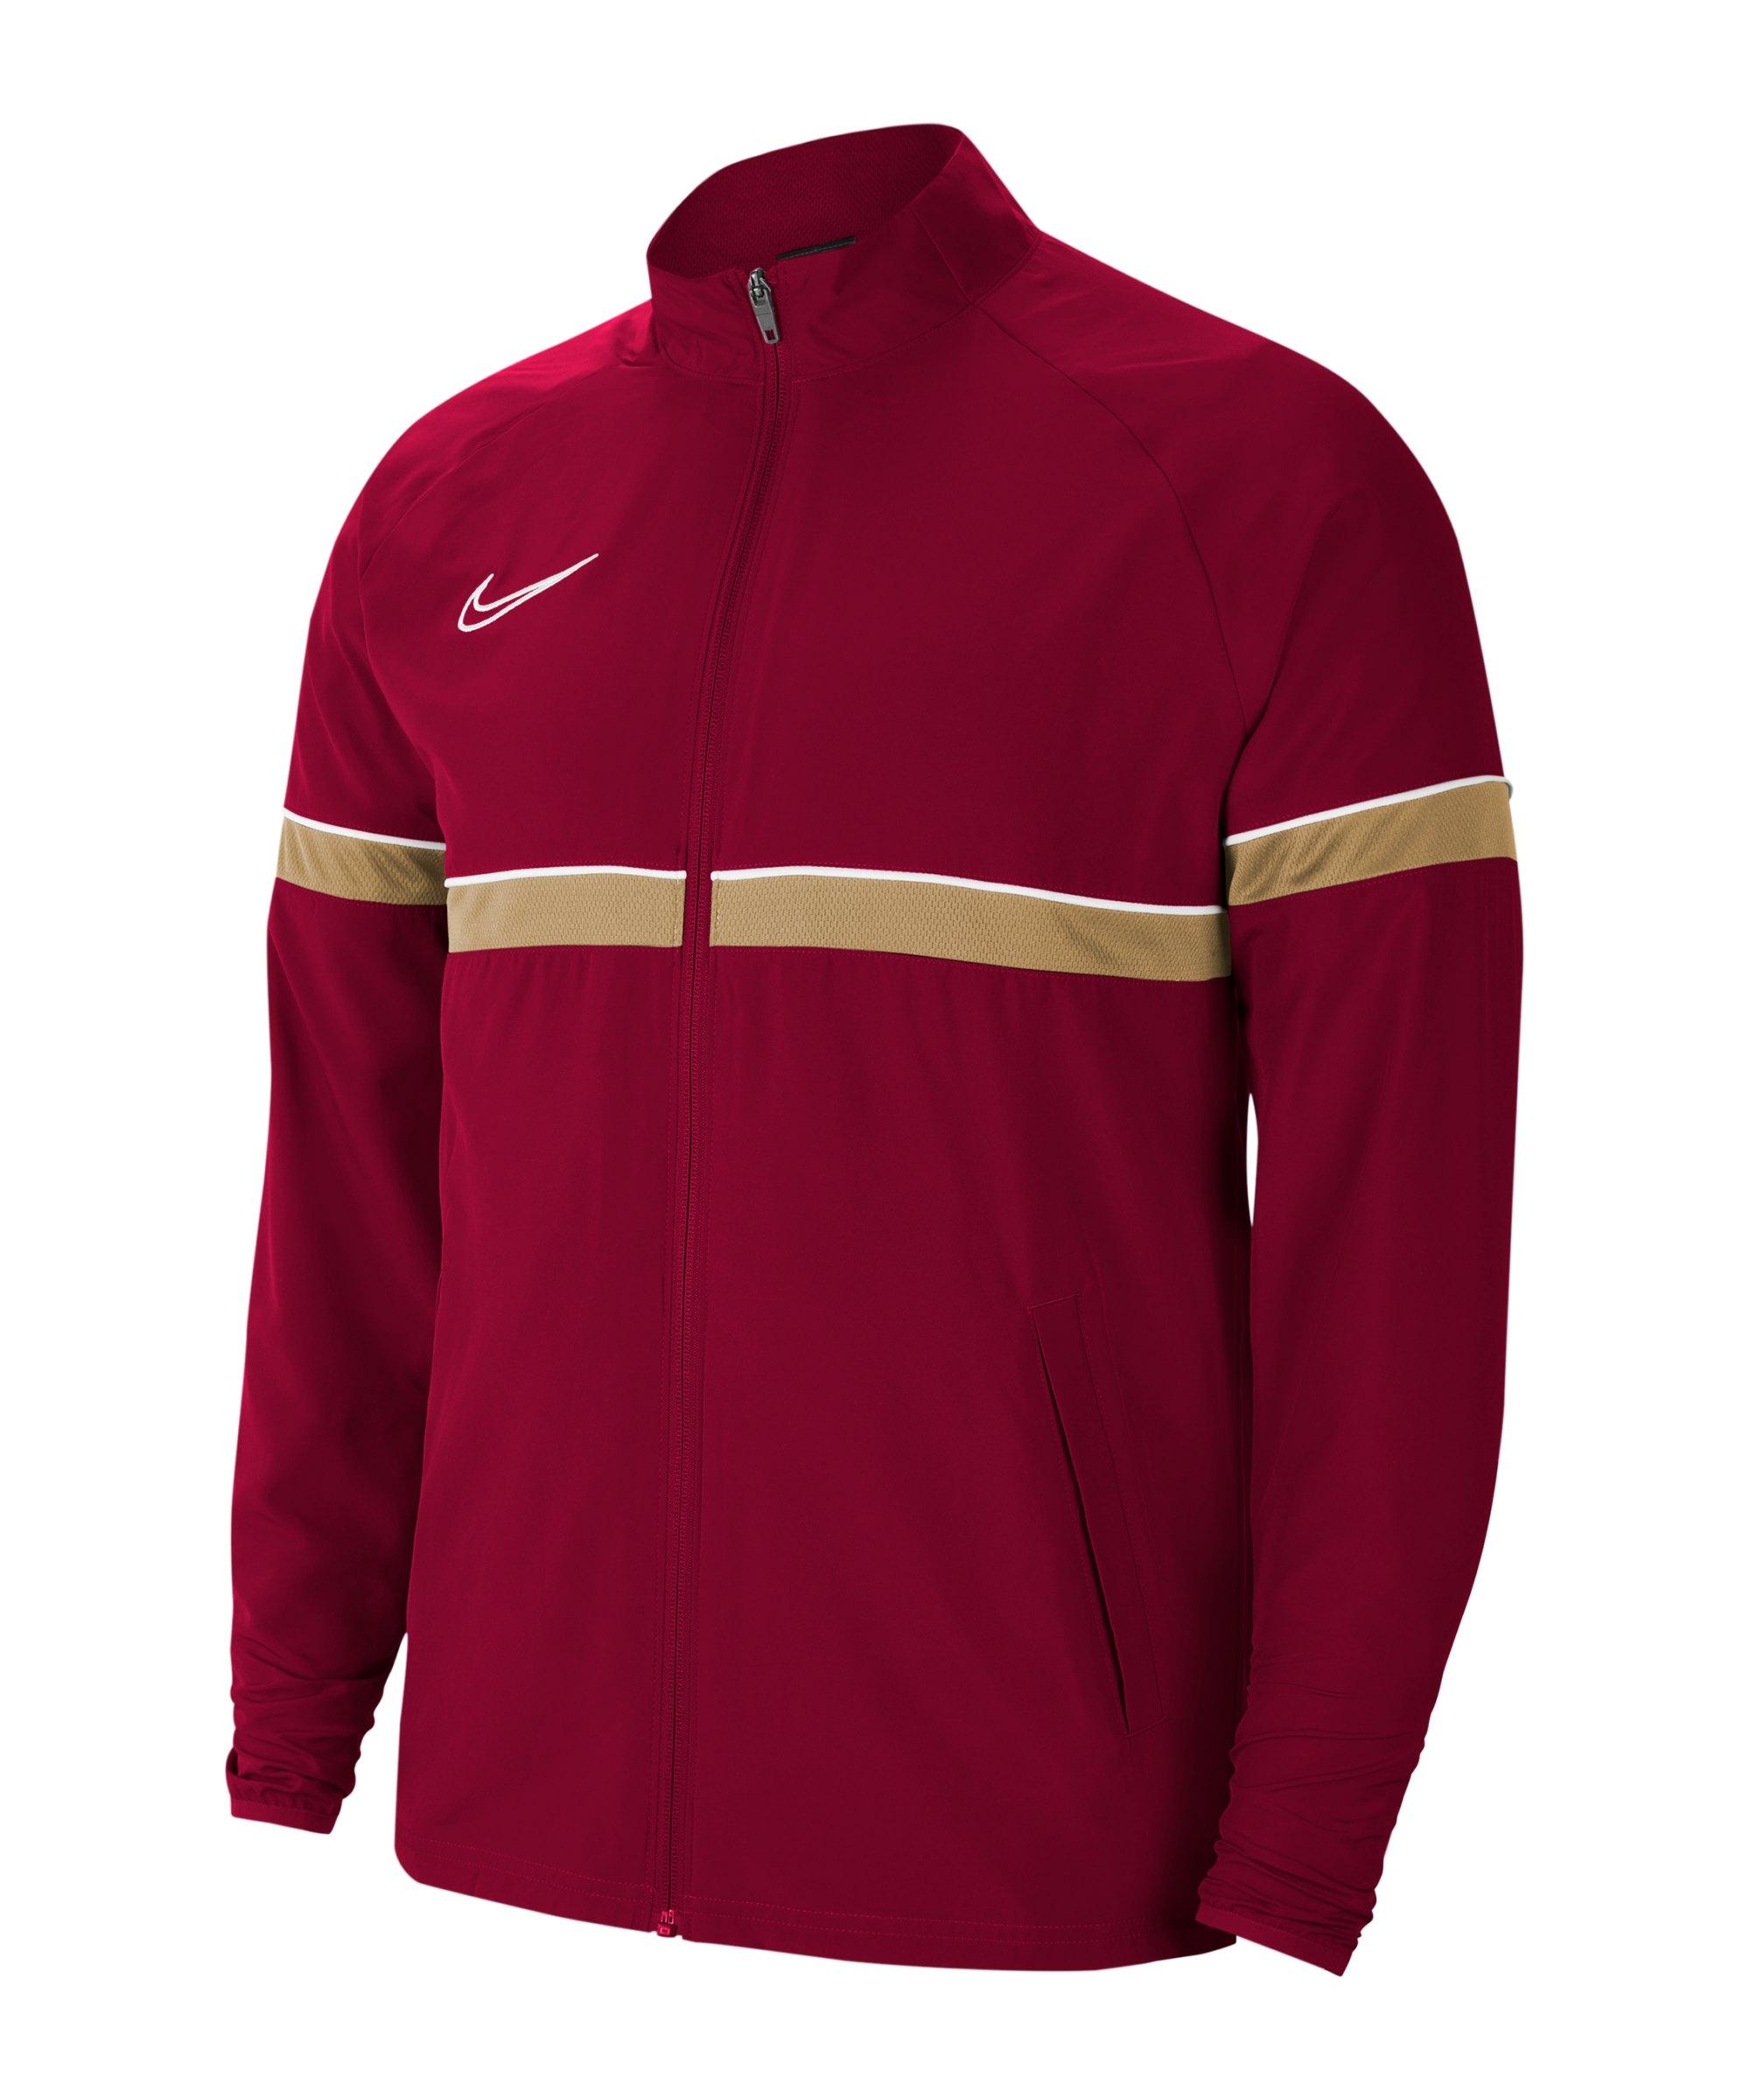 Nike Academy 21 Woven Trainingsjacke Rot F677 - rot